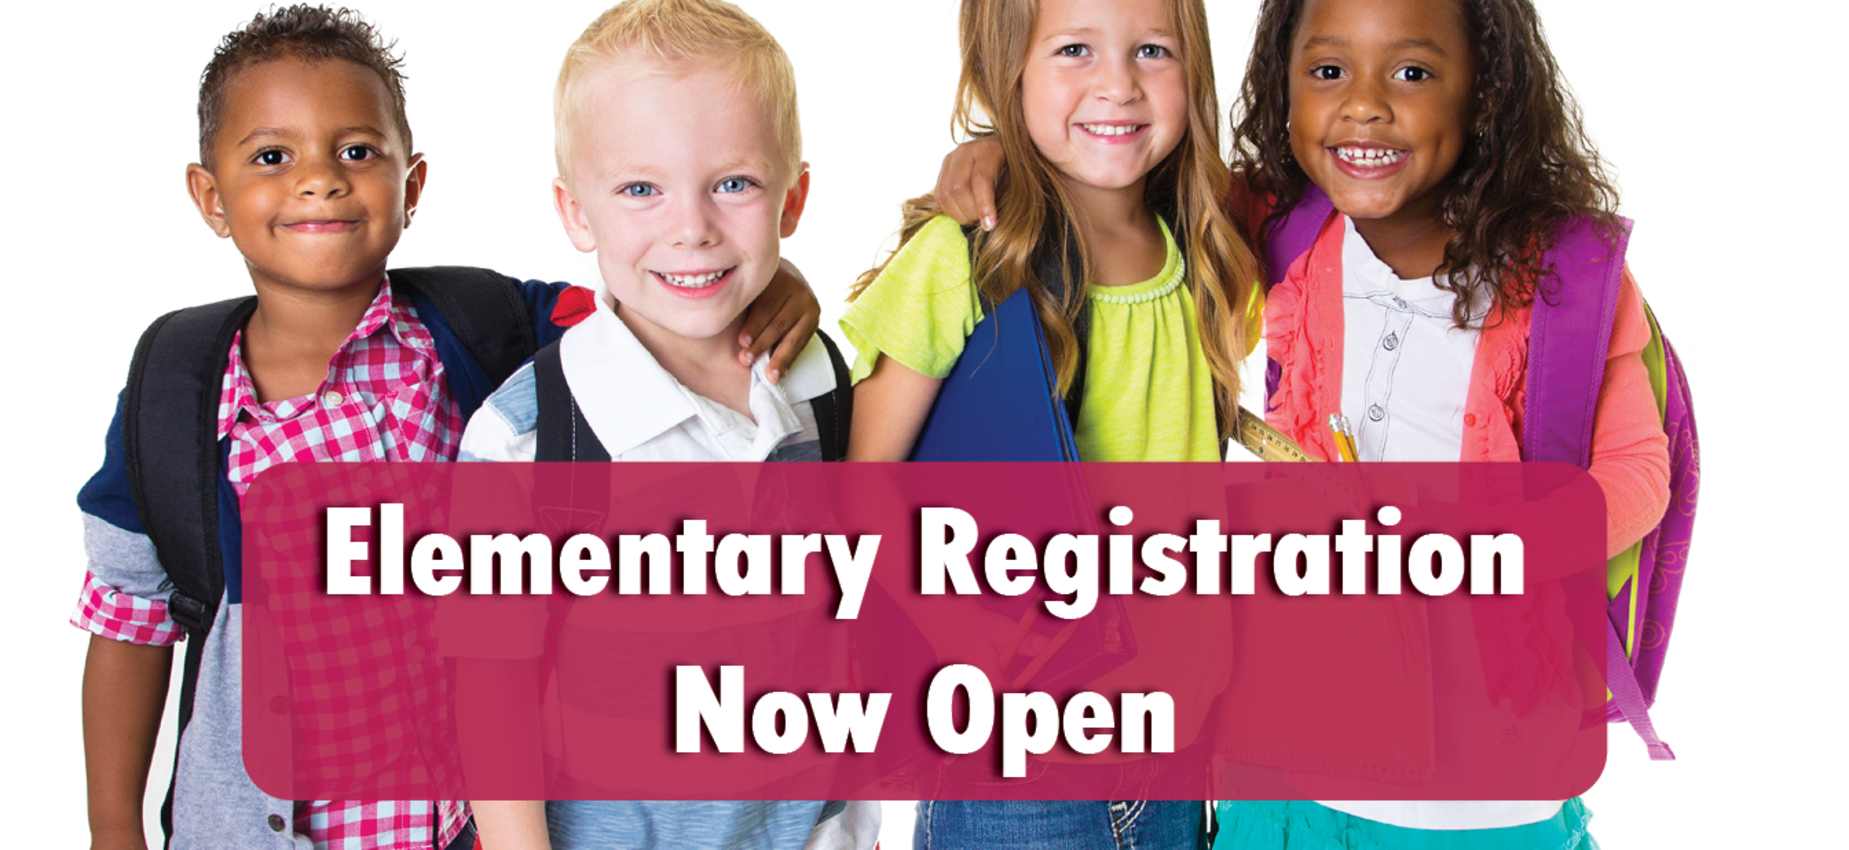 Elementary registration